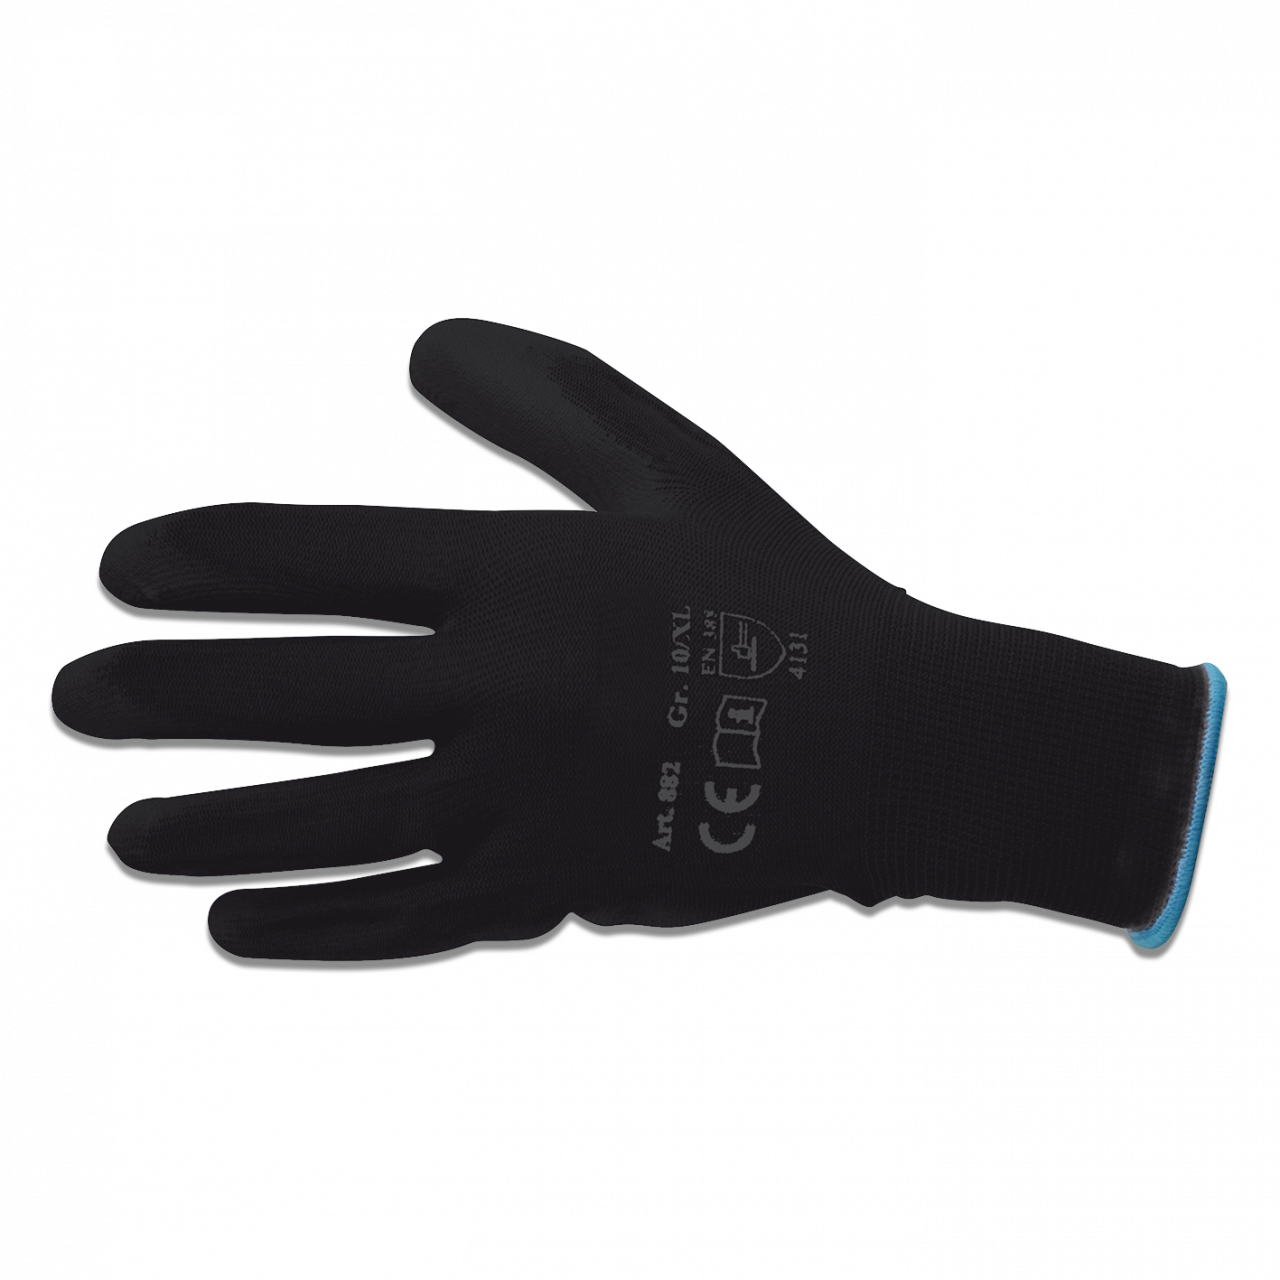 Handschuhe Bild 1